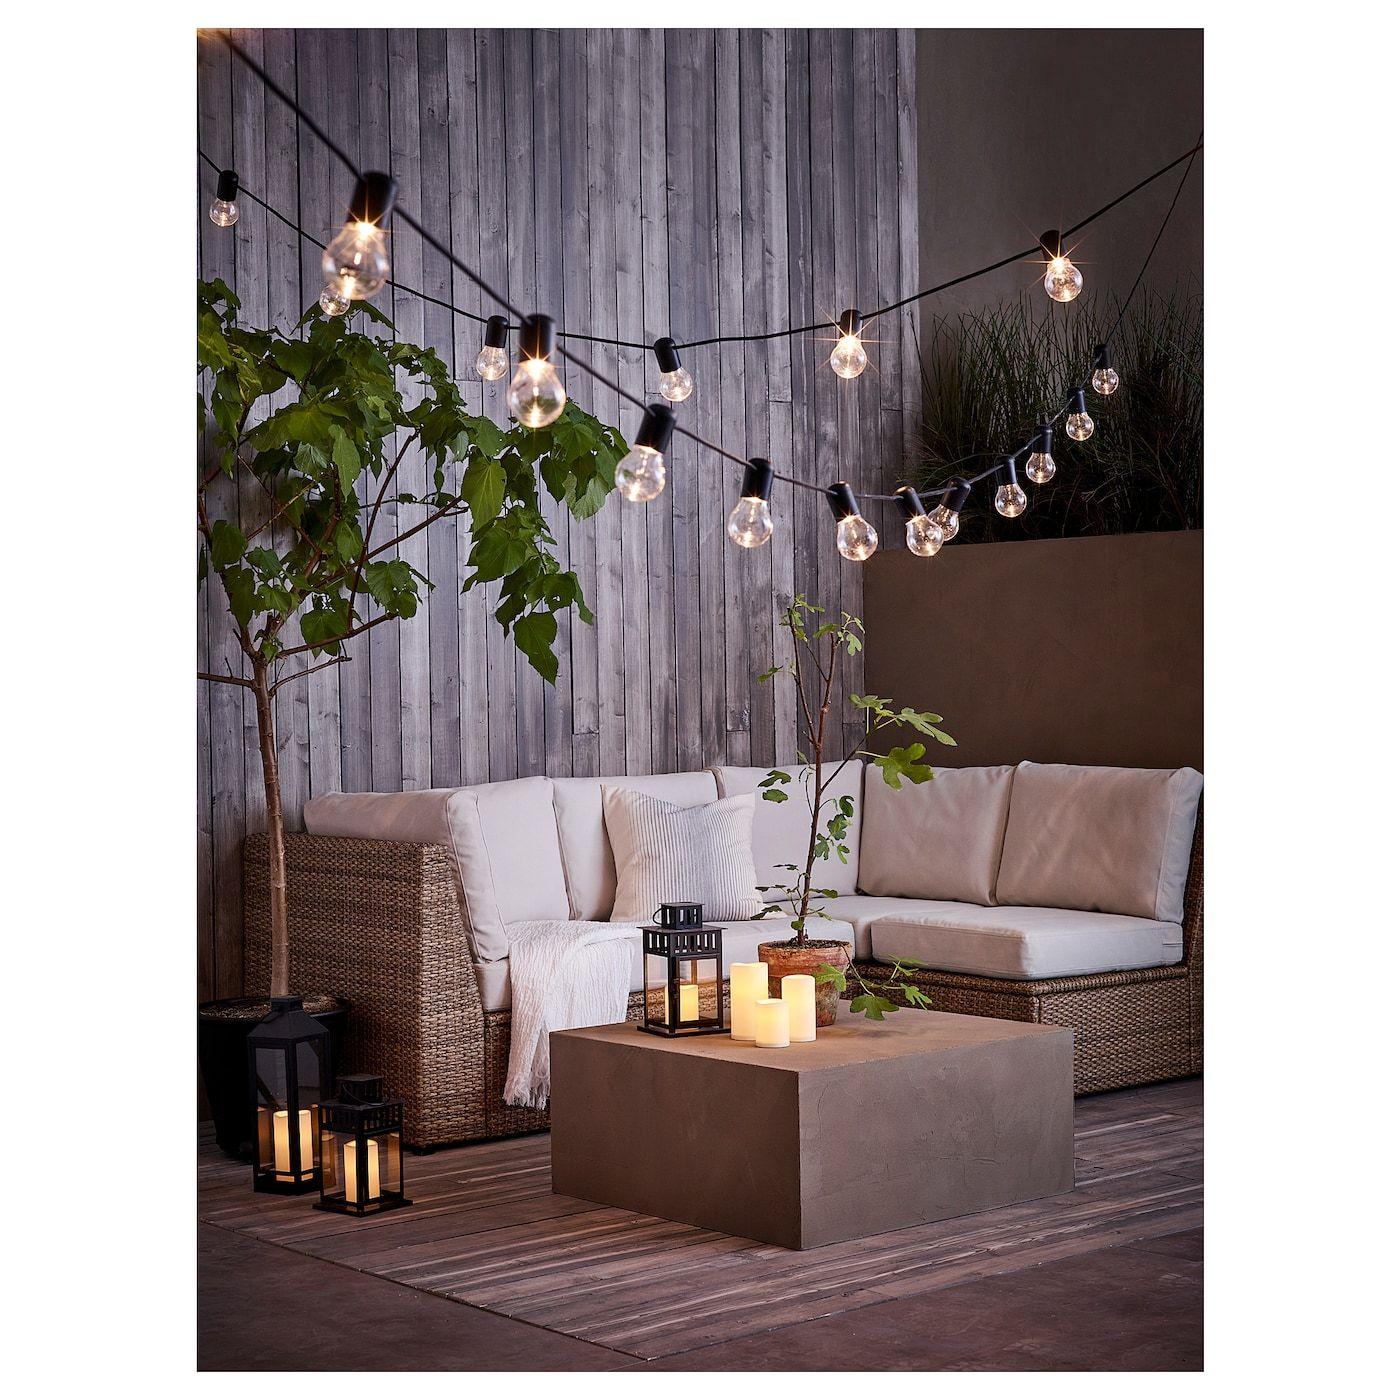 Sollerön Modular Corner Sofa 3-Seat, Outdoor - Brown, Frösön ... intérieur Salon De Jardin Ikea